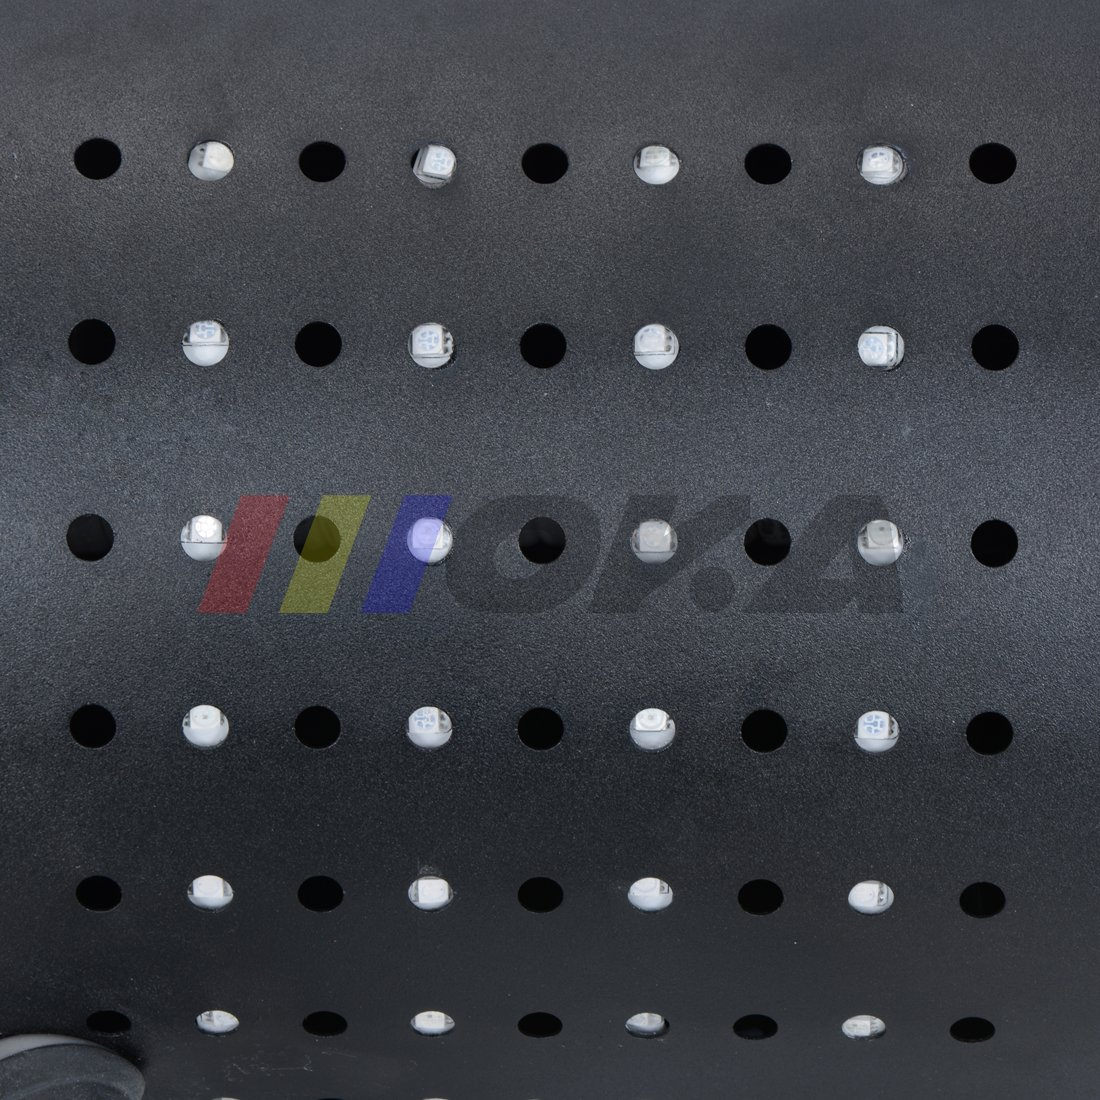 MOKA SFX LED Co2 Confetti Handheld Stage Effect Gun Shipping from USA for Wedding Club Nightclub Party by MOKA SFX (Image #4)